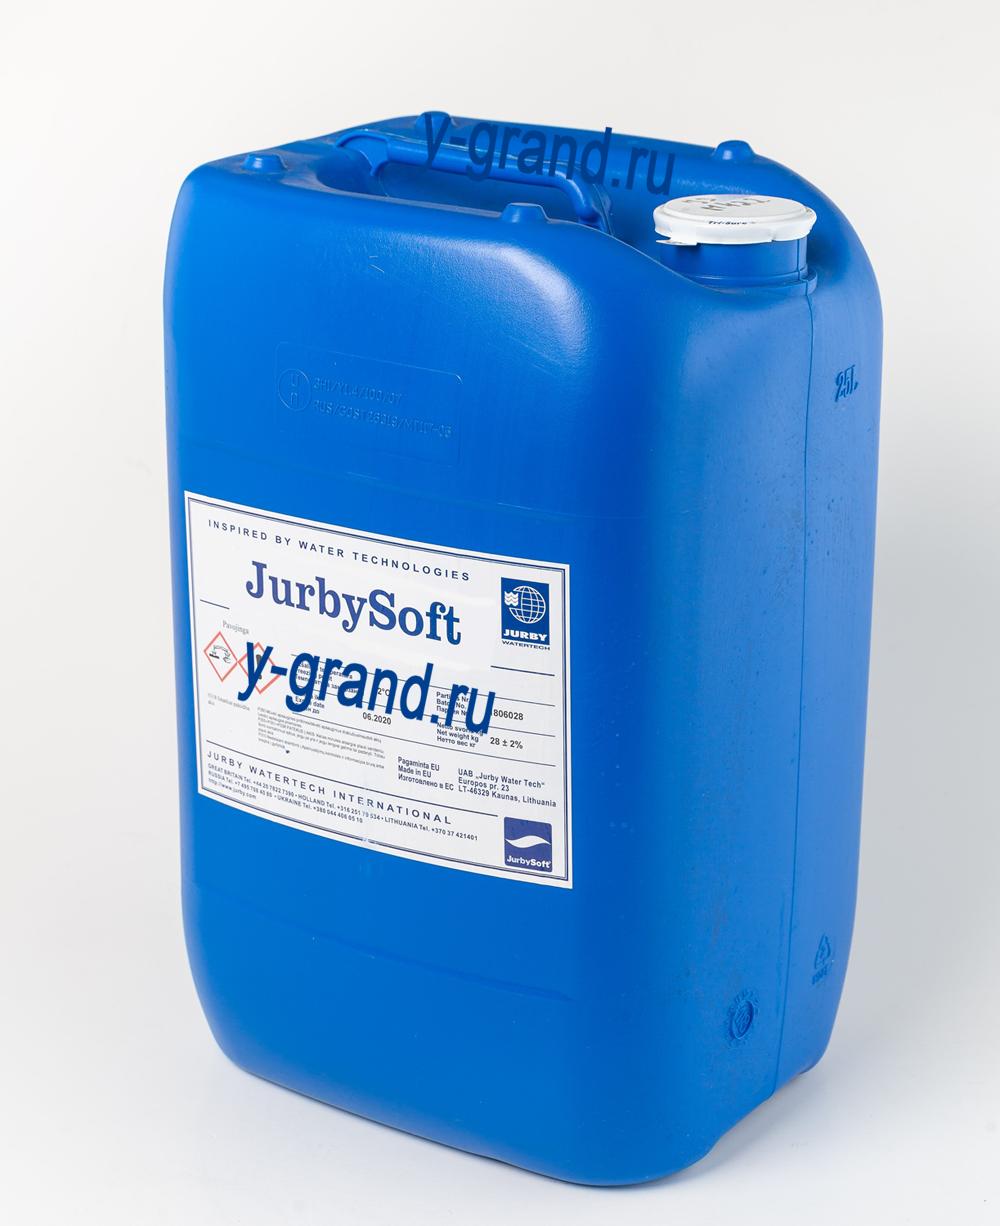 JurbySoft DG 1